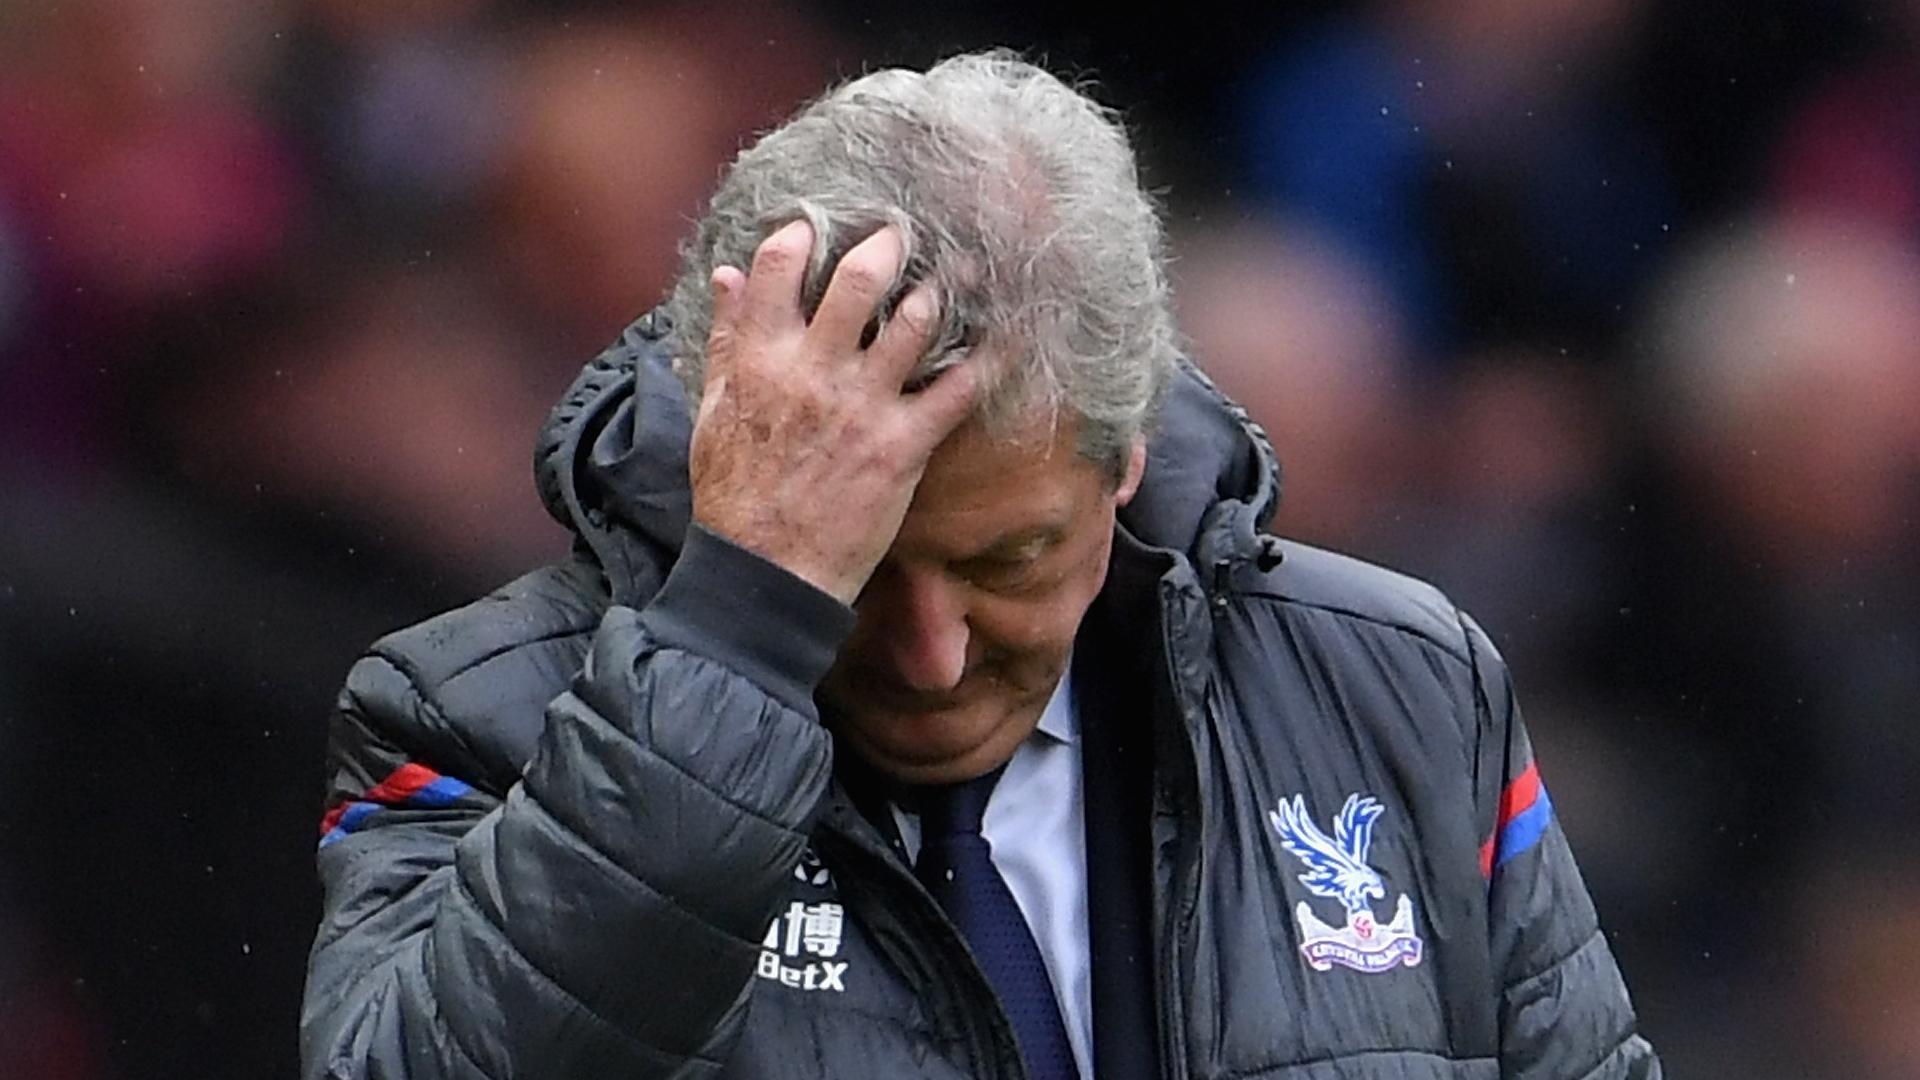 Crystal Palace can score without Zaha, says Hodgson